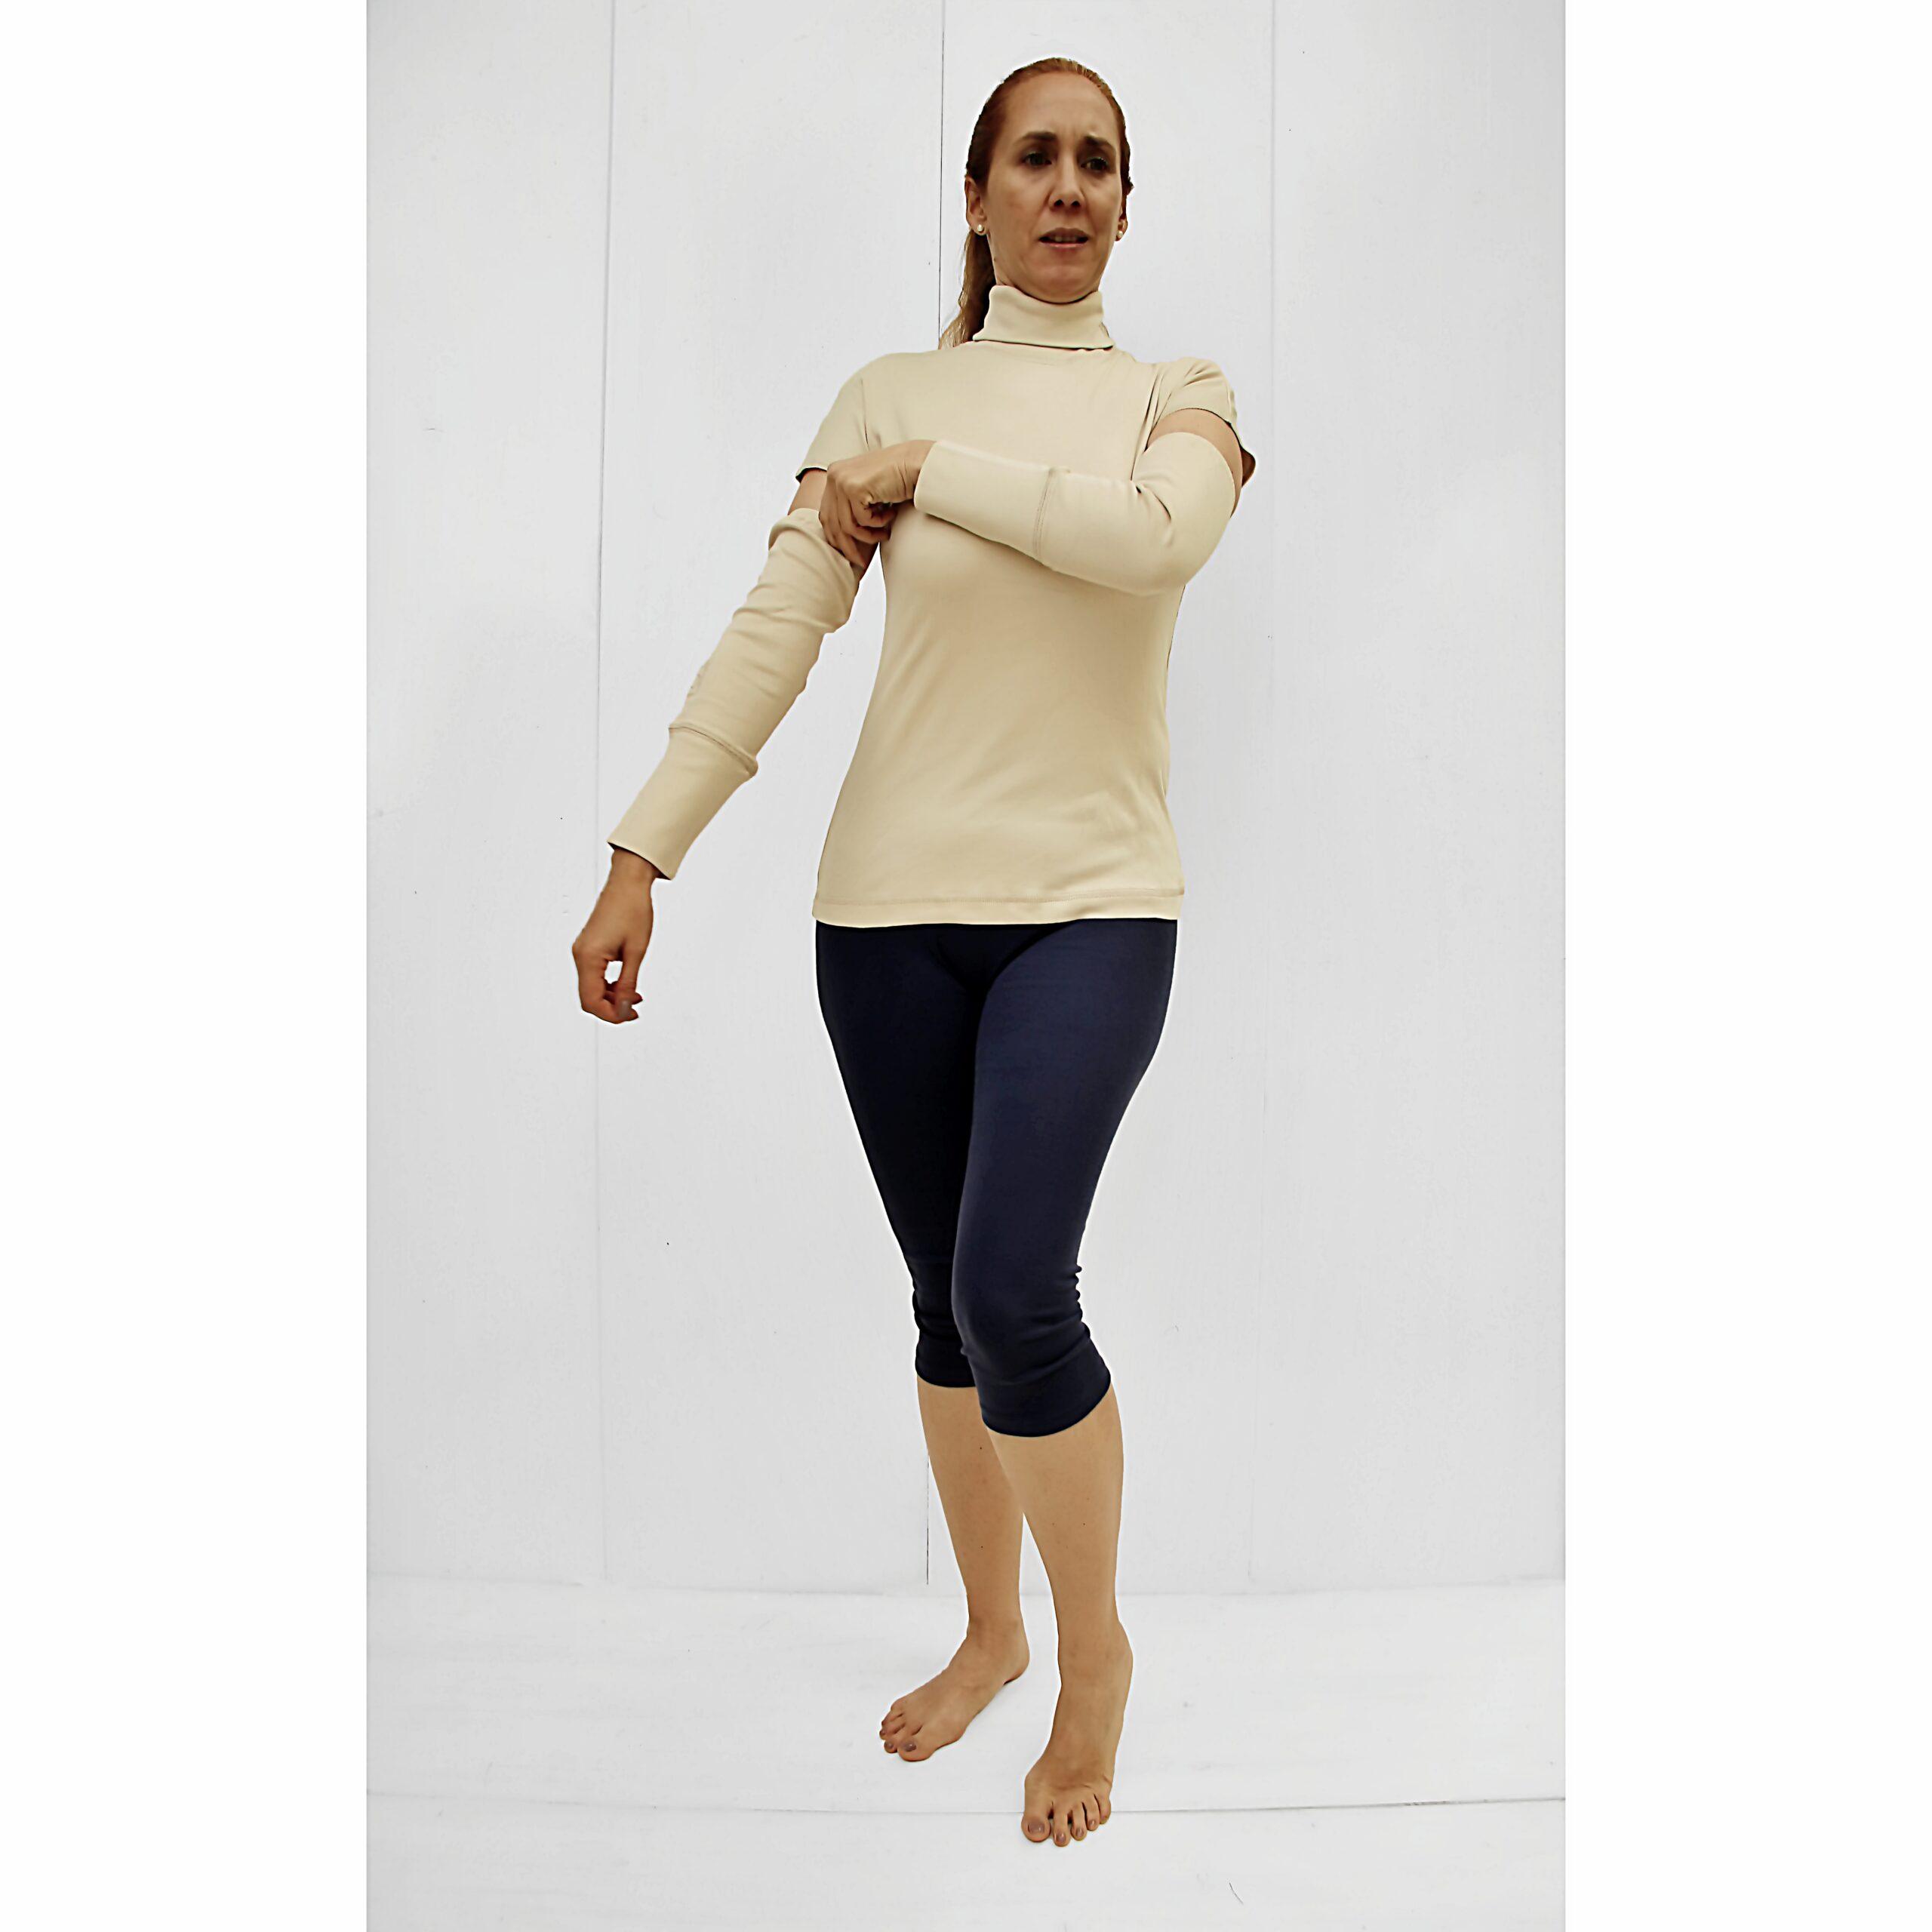 detached sleeves turtleneck slowfashion pima cotton organic